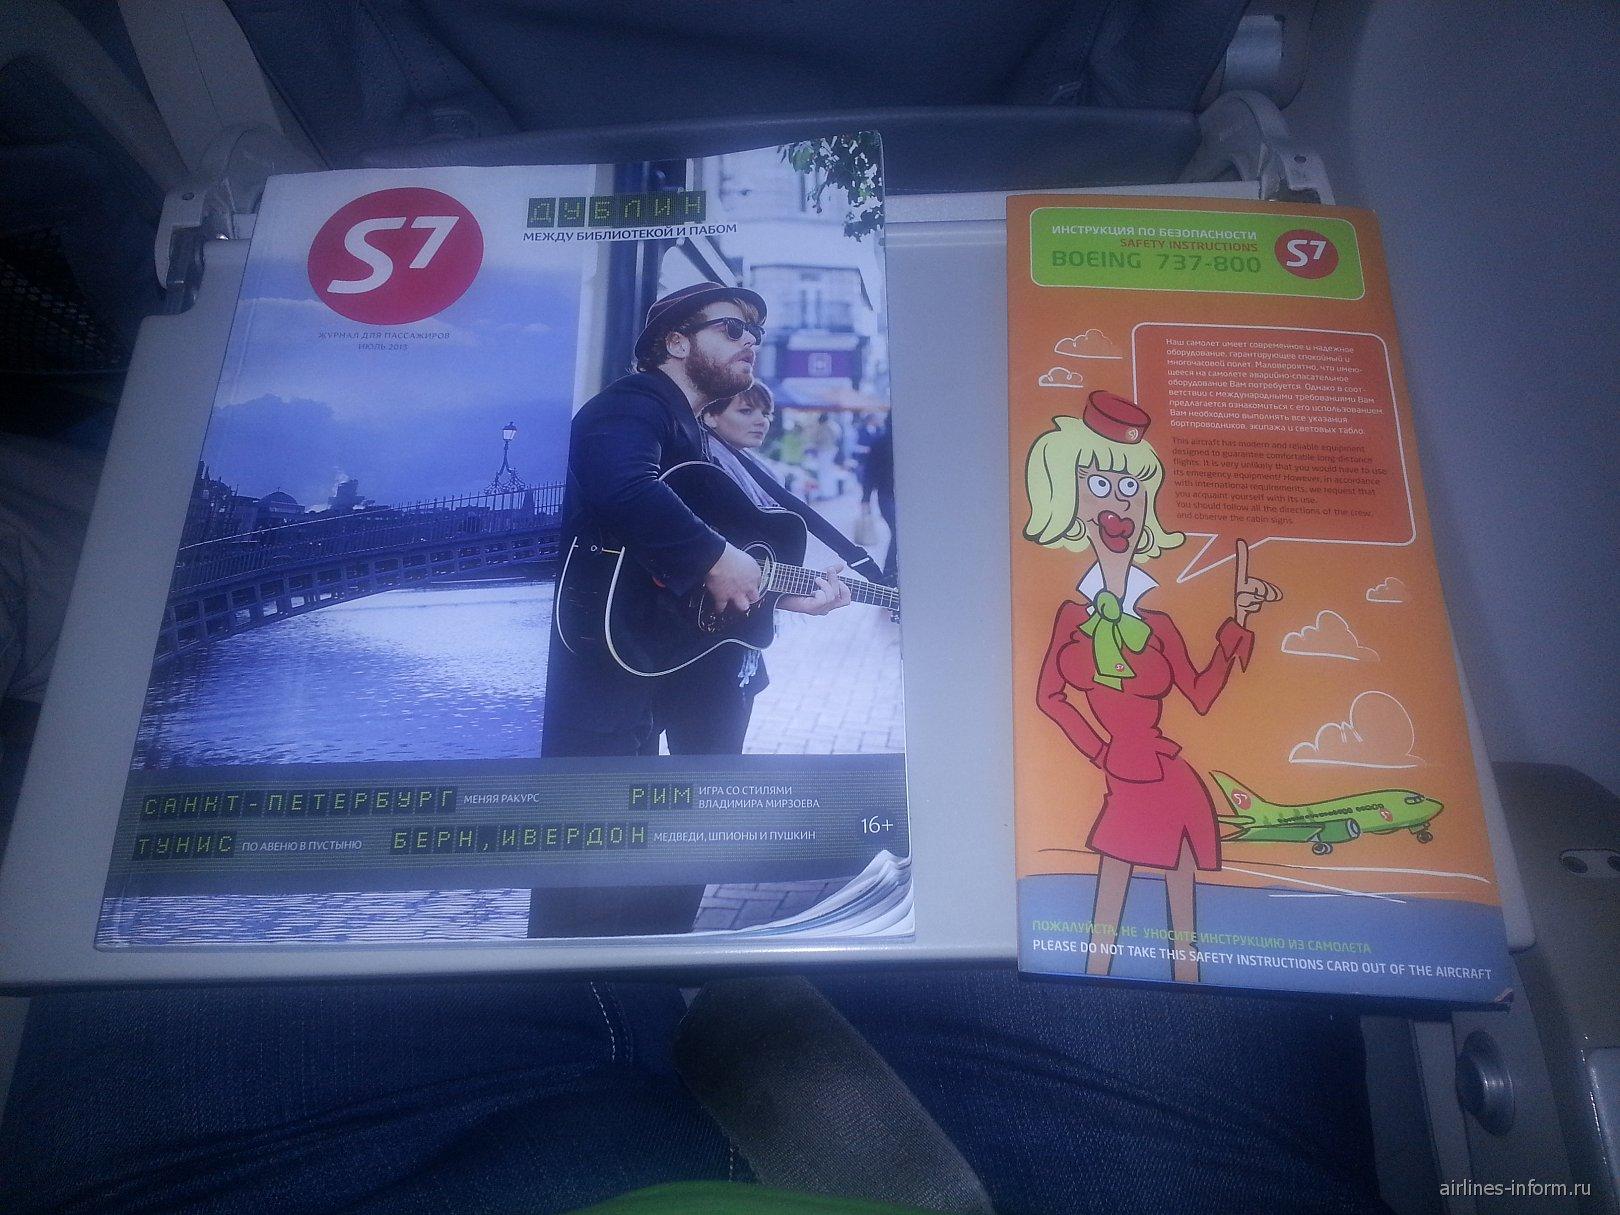 Бортовые журналы S7 Airlines